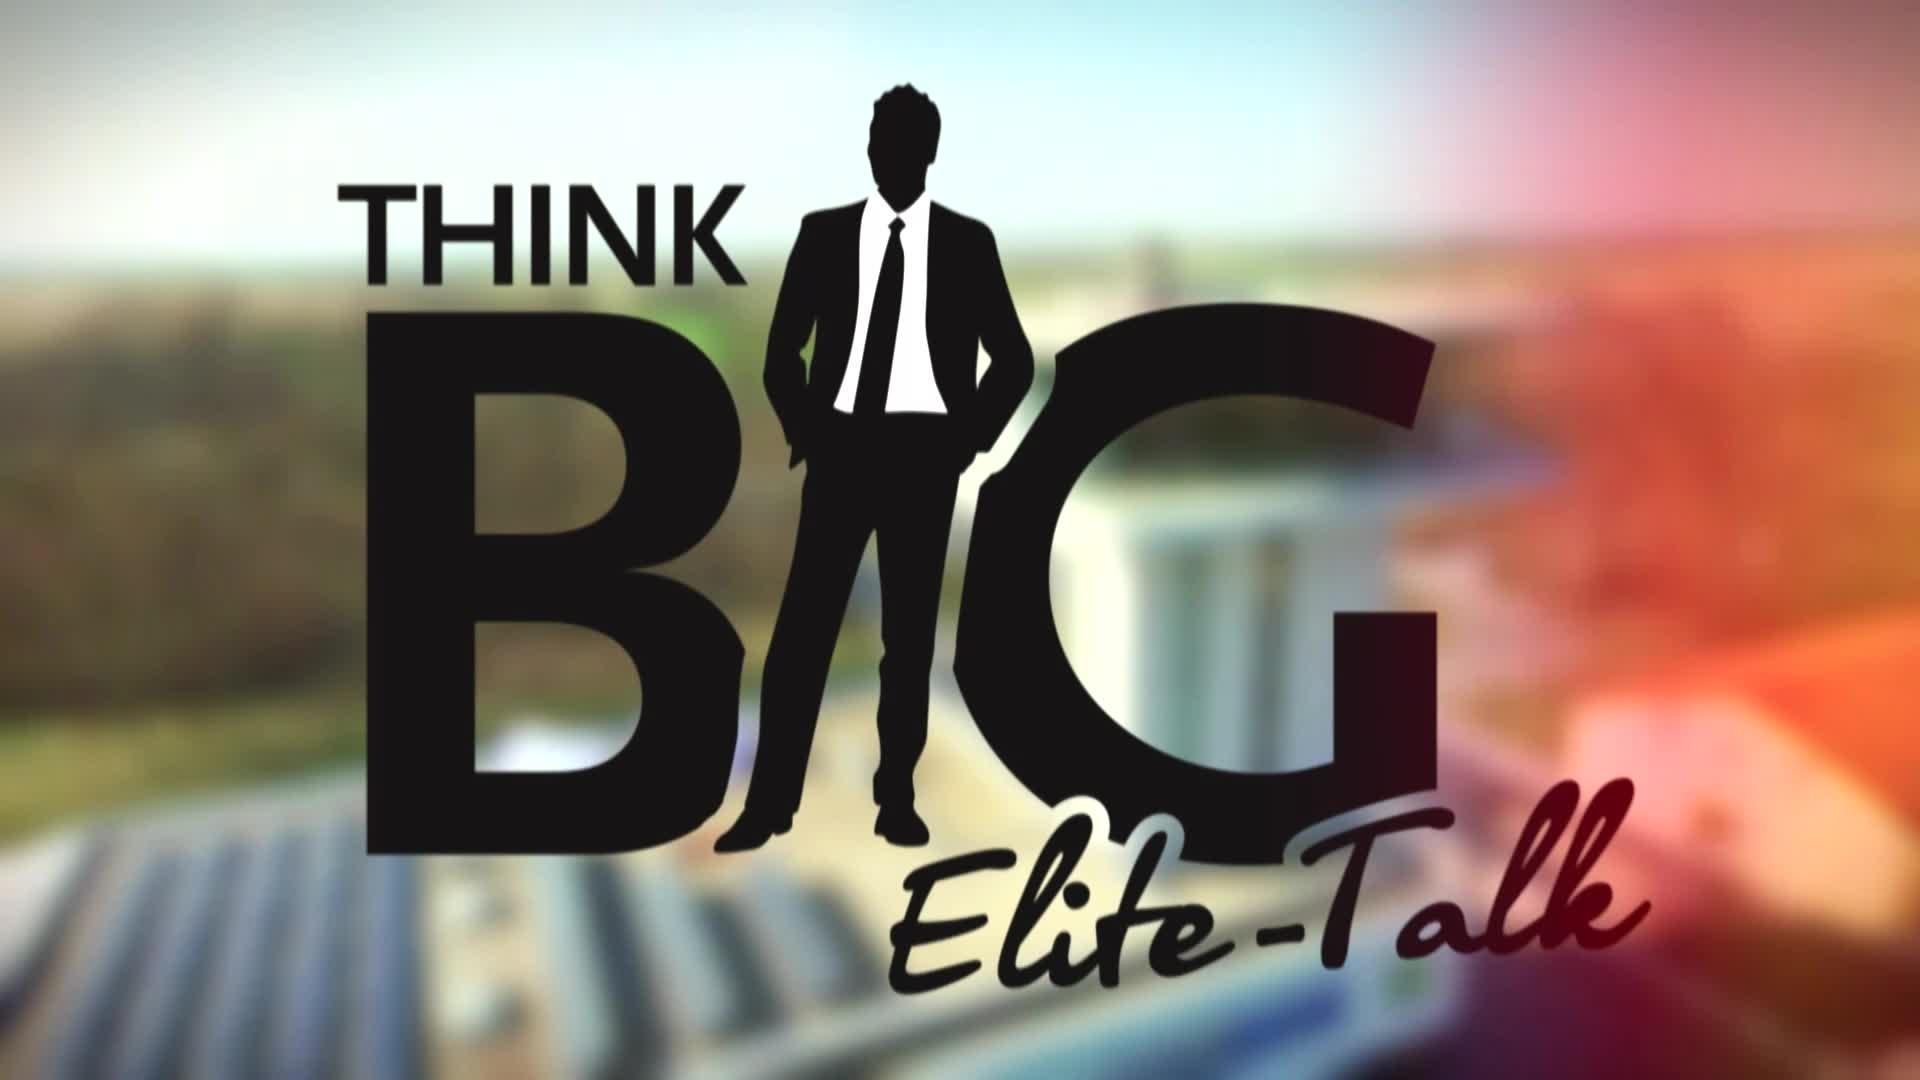 Think BIG - Teaser Mauro Cederle